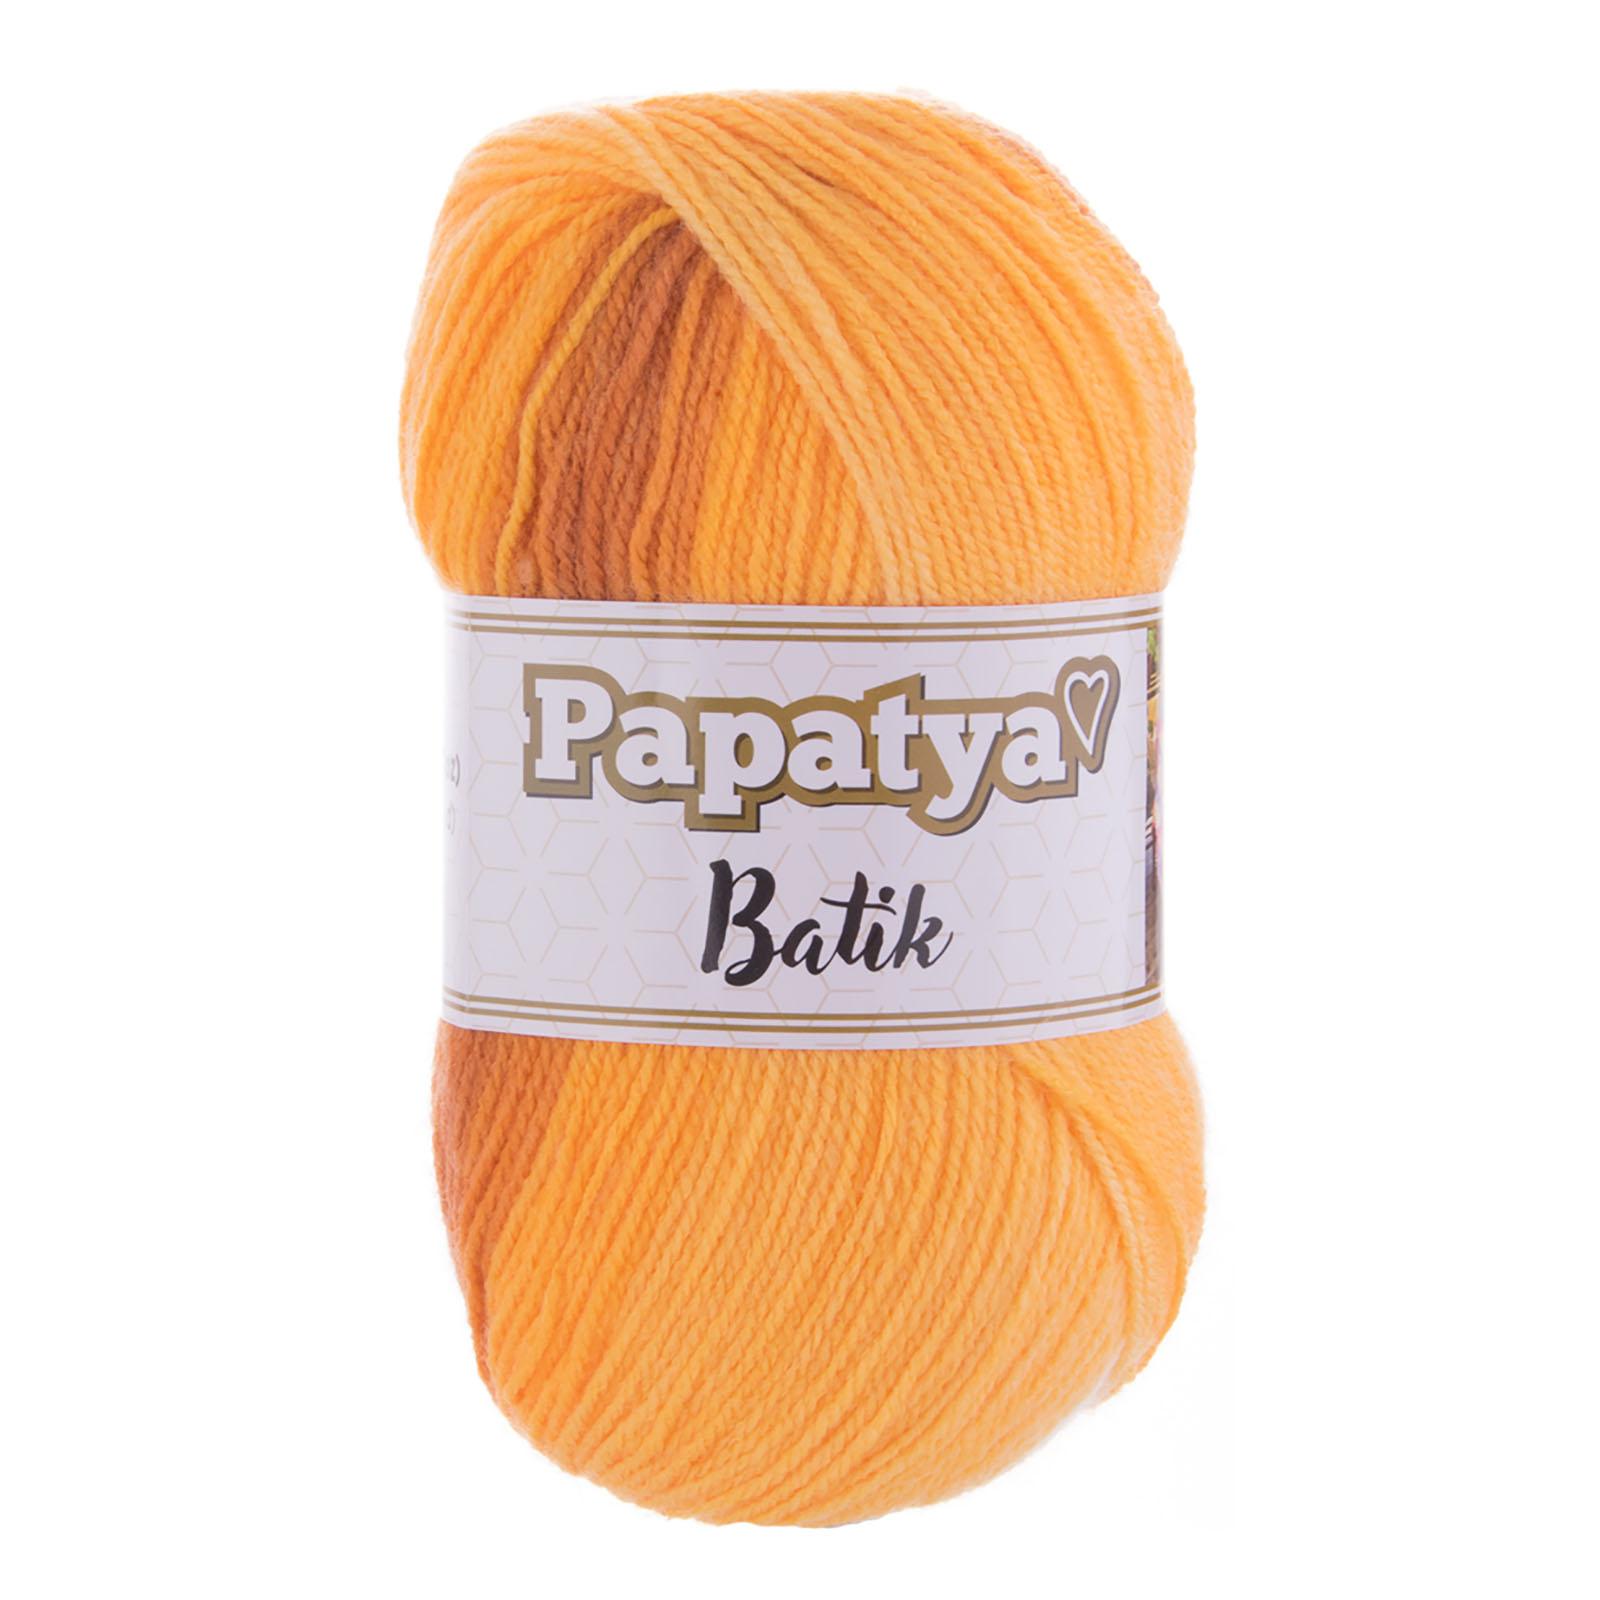 100g Farbverlaufsgarn Papatya Batik Strick-Wolle Strickgarn Häkelgarn Farbwahl – Bild 13